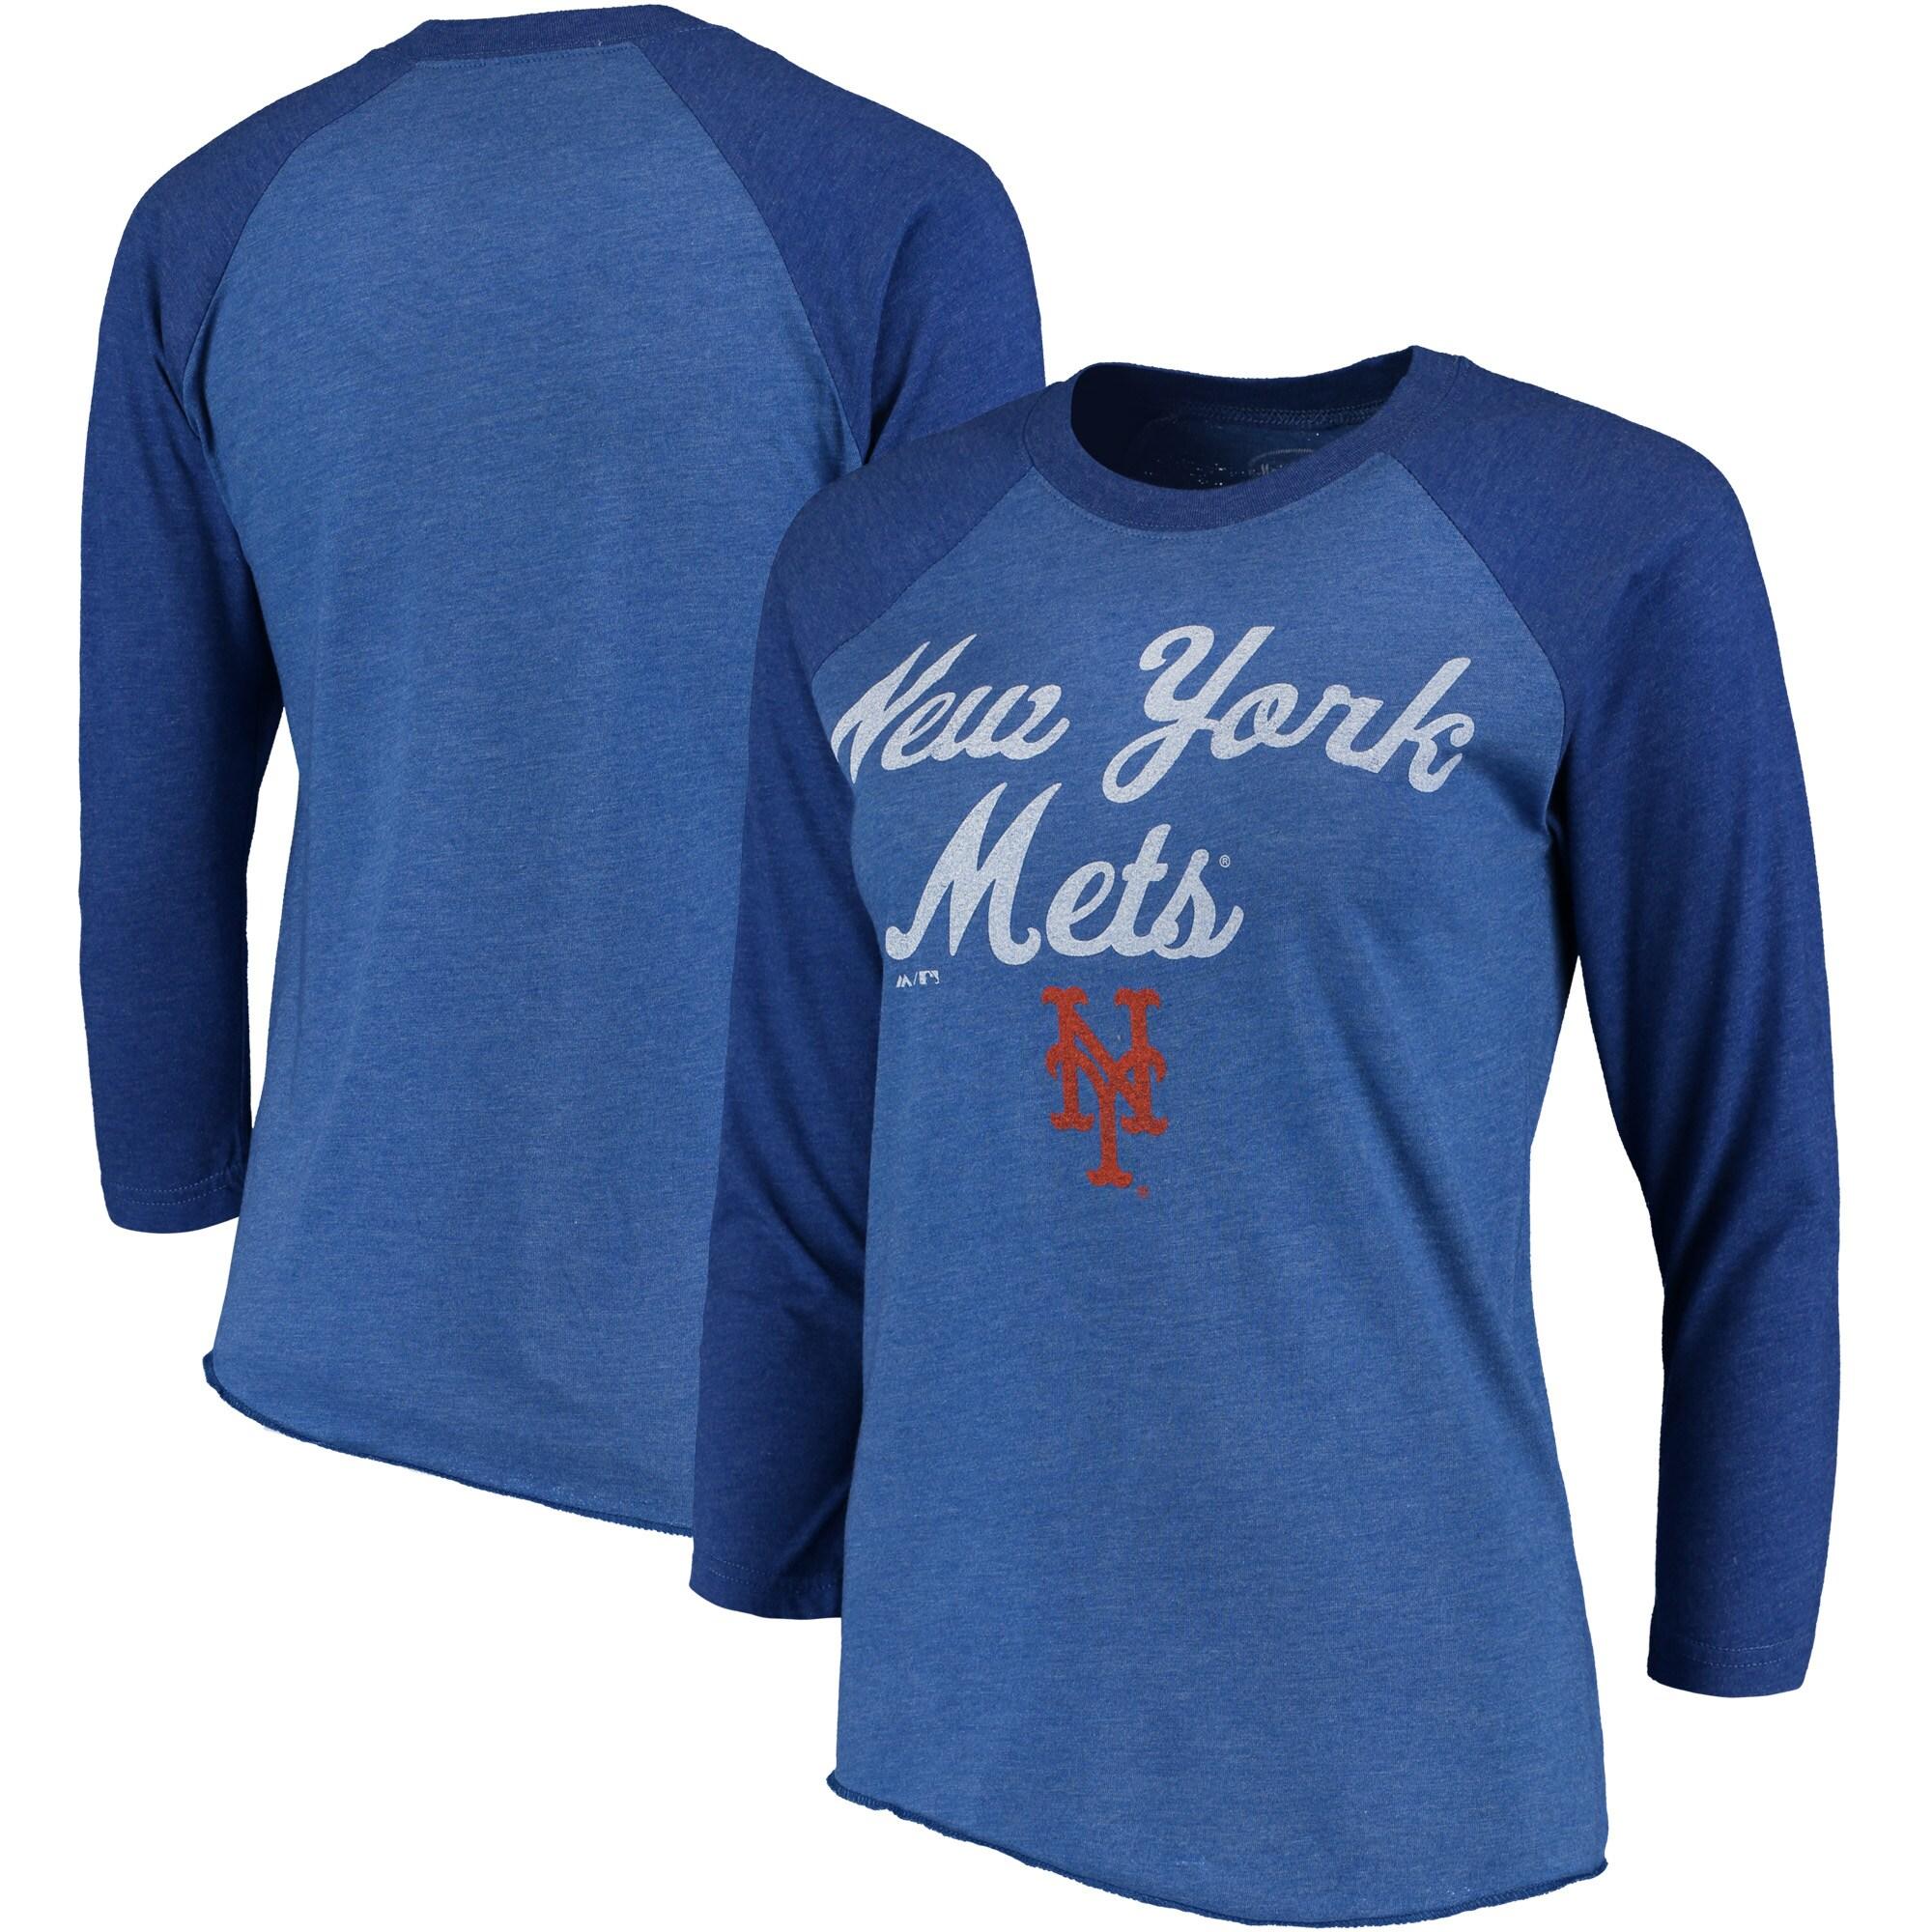 New York Mets Majestic Threads Women's 3/4-Sleeve Raglan T-Shirt - Royal